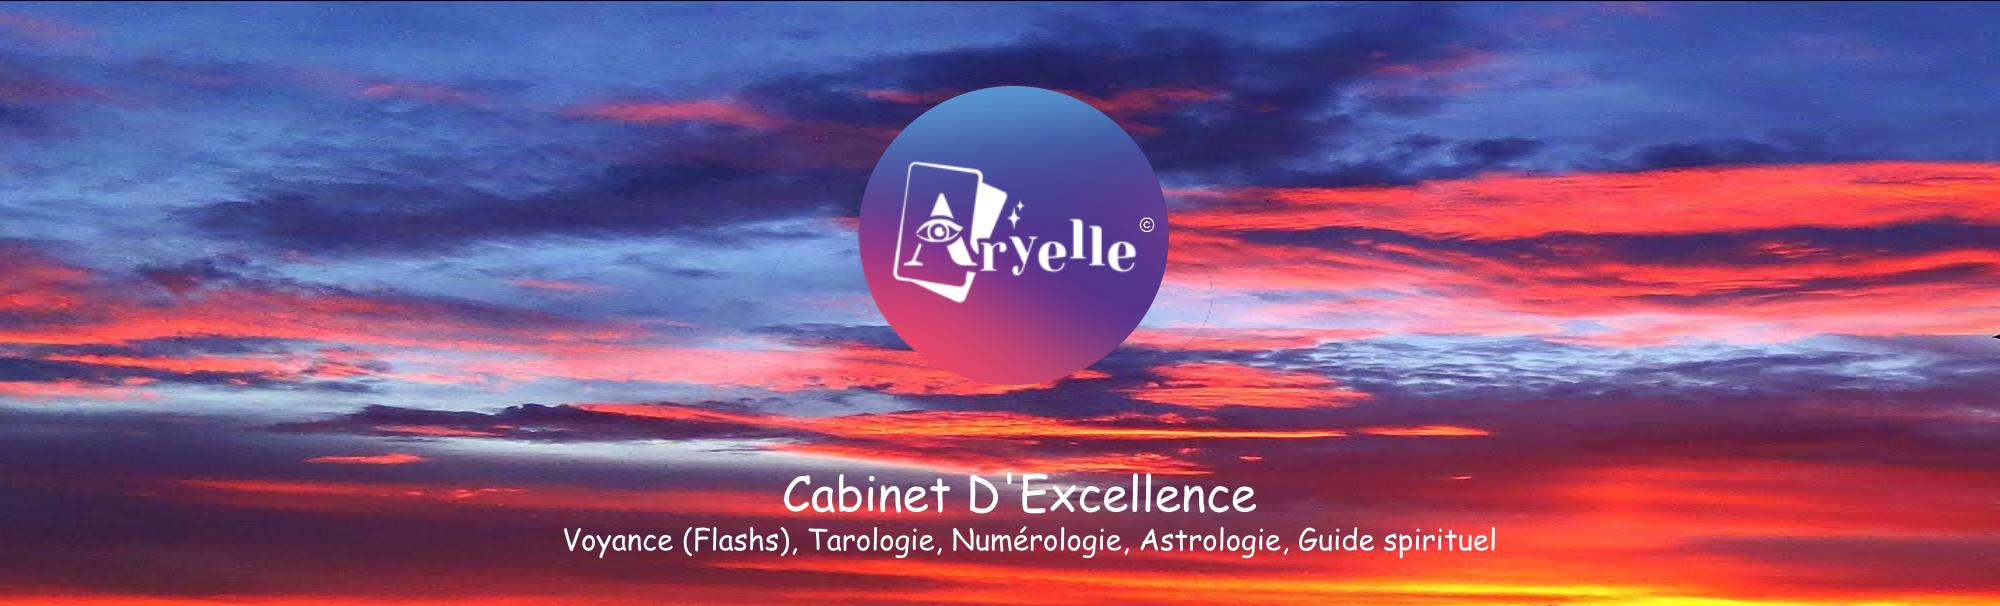 Voyance flash, Tarologie, Numérologie, Astrologie, Guide spirituel, Cartomancie